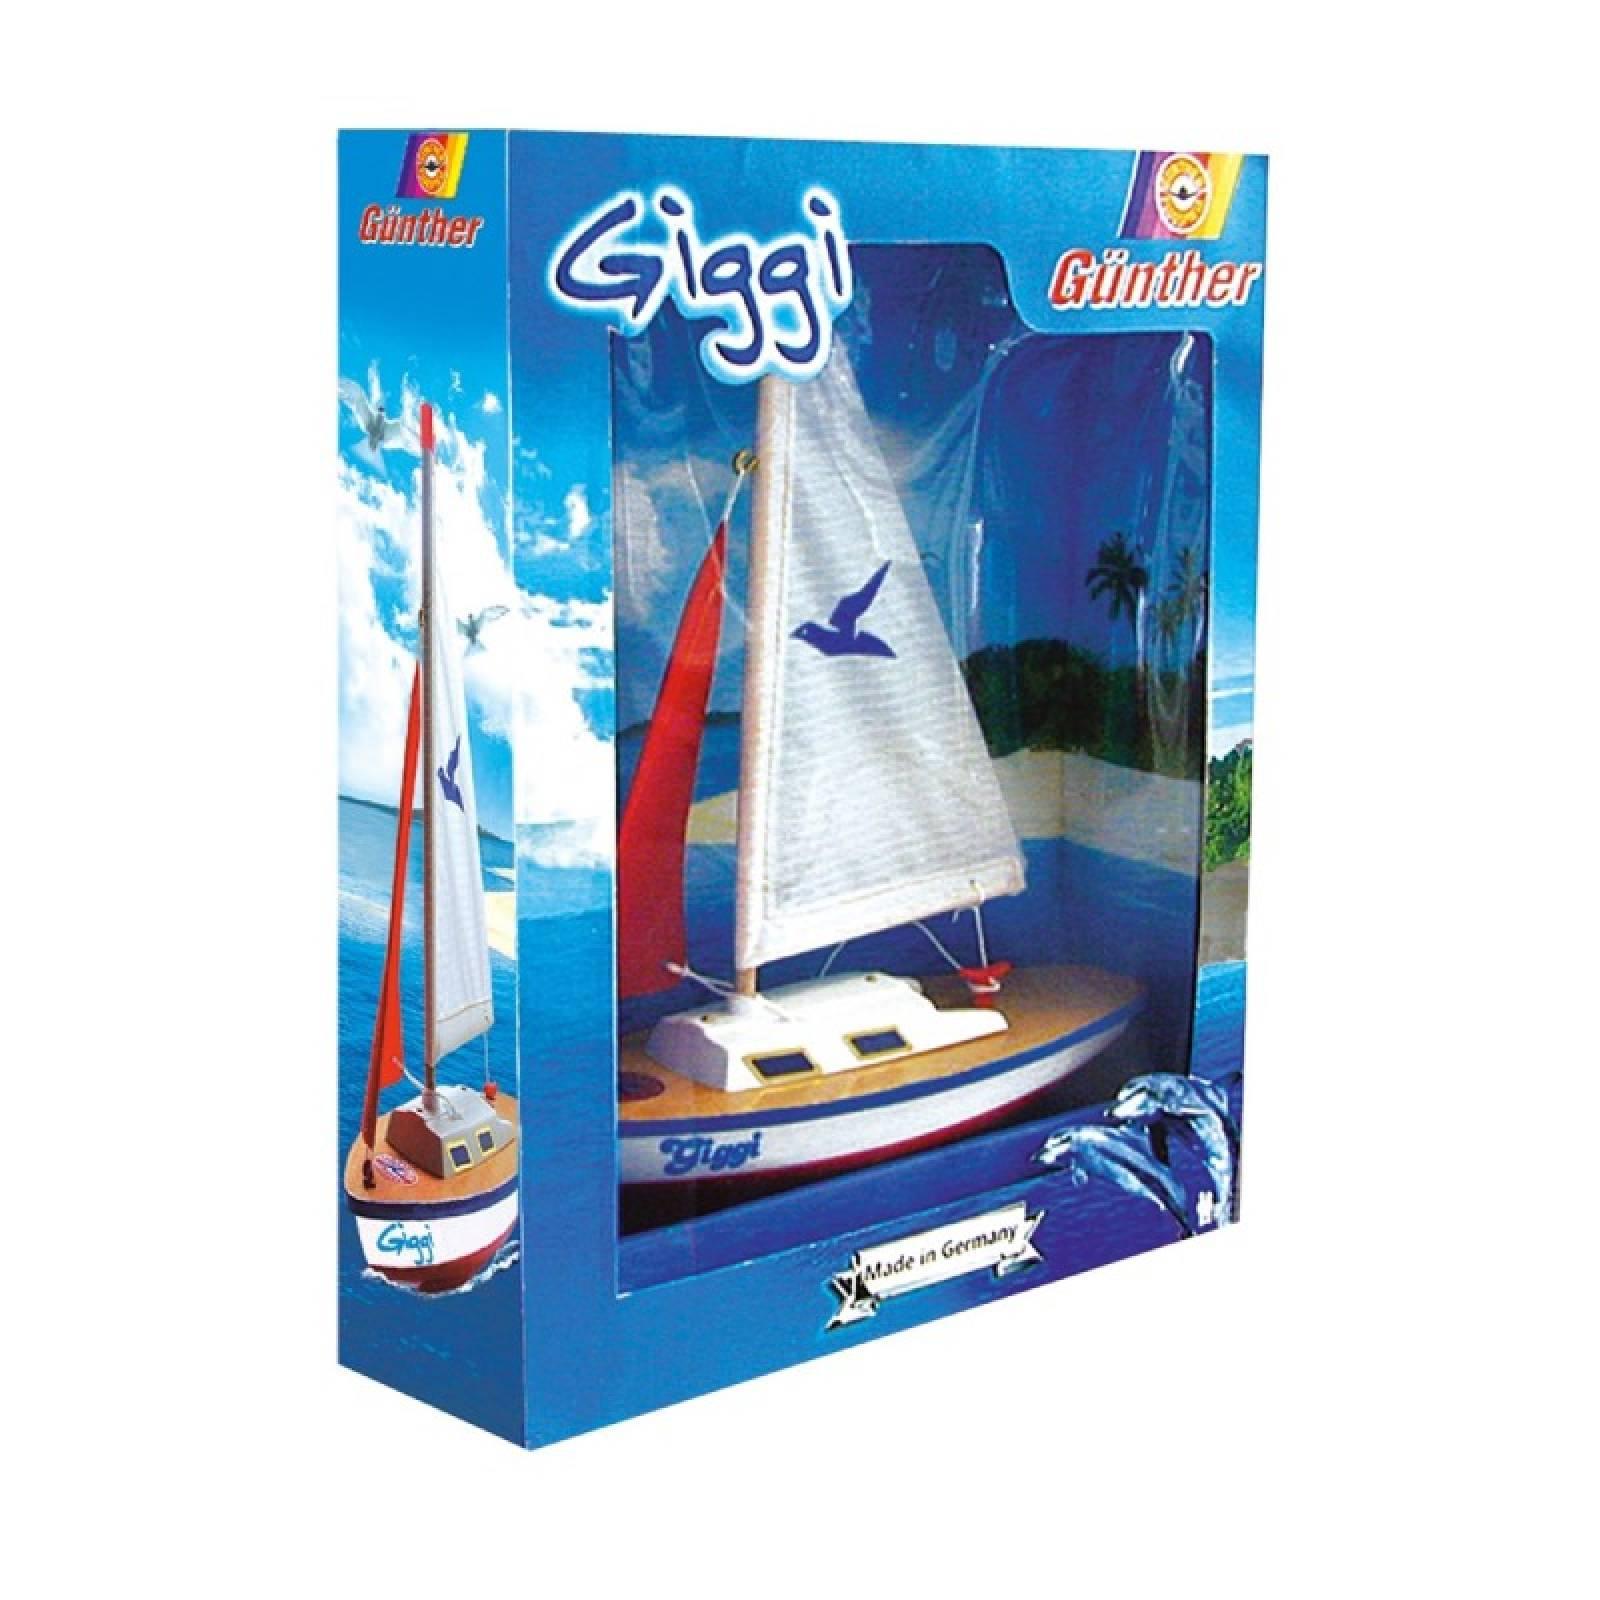 Gunther Giggi Sailing Boat Toy 8+ thumbnails